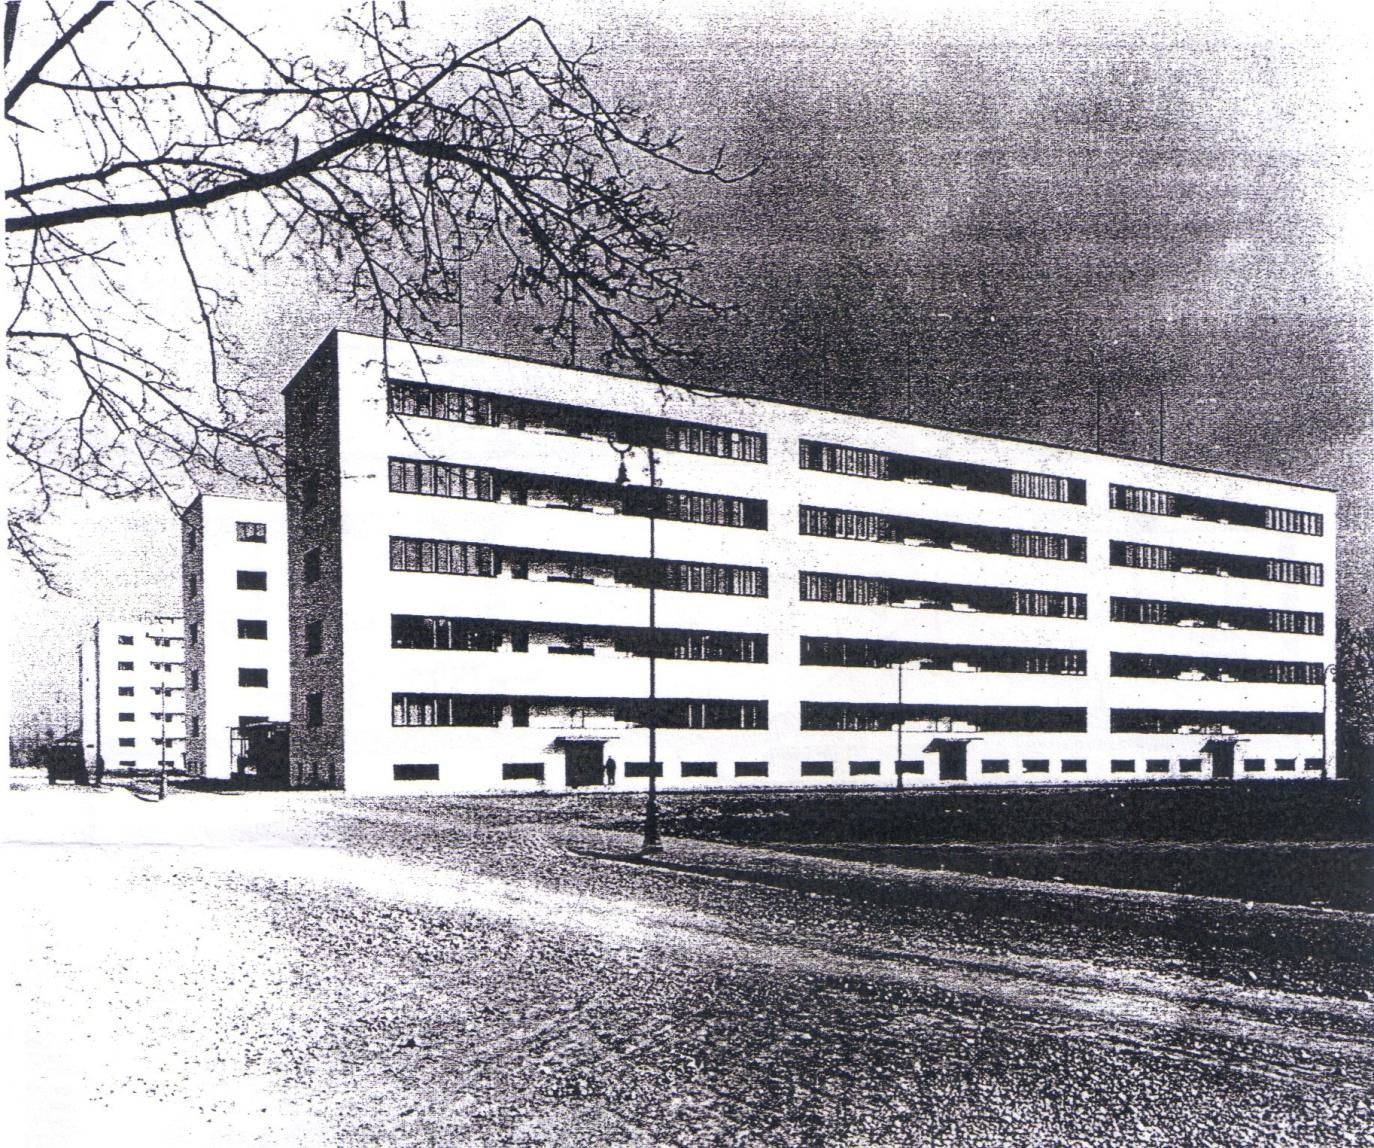 Historia de la arquitectura moderna apartamentos m nimos for Historia de la arquitectura moderna